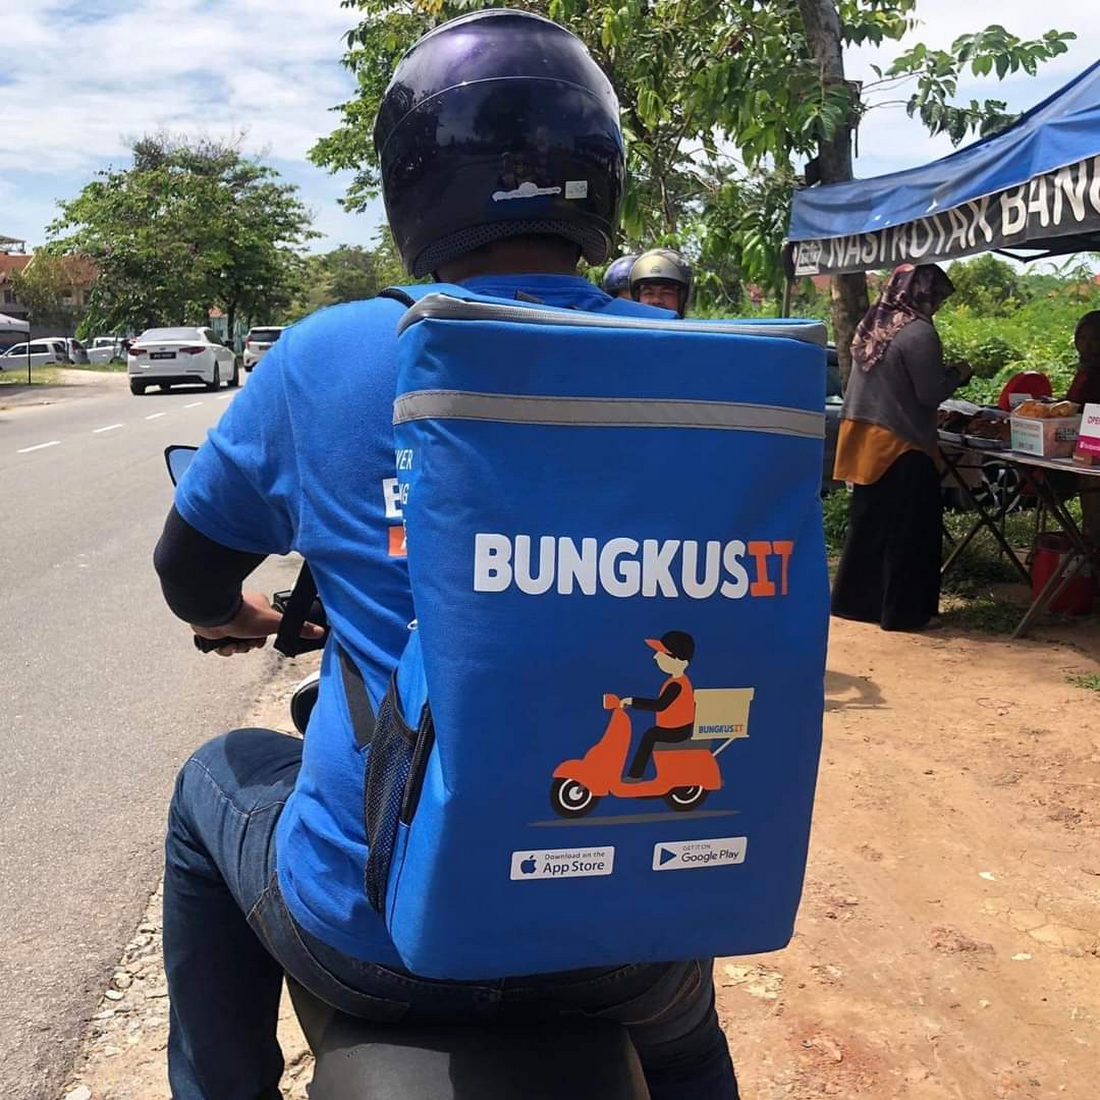 BungkusIT rider